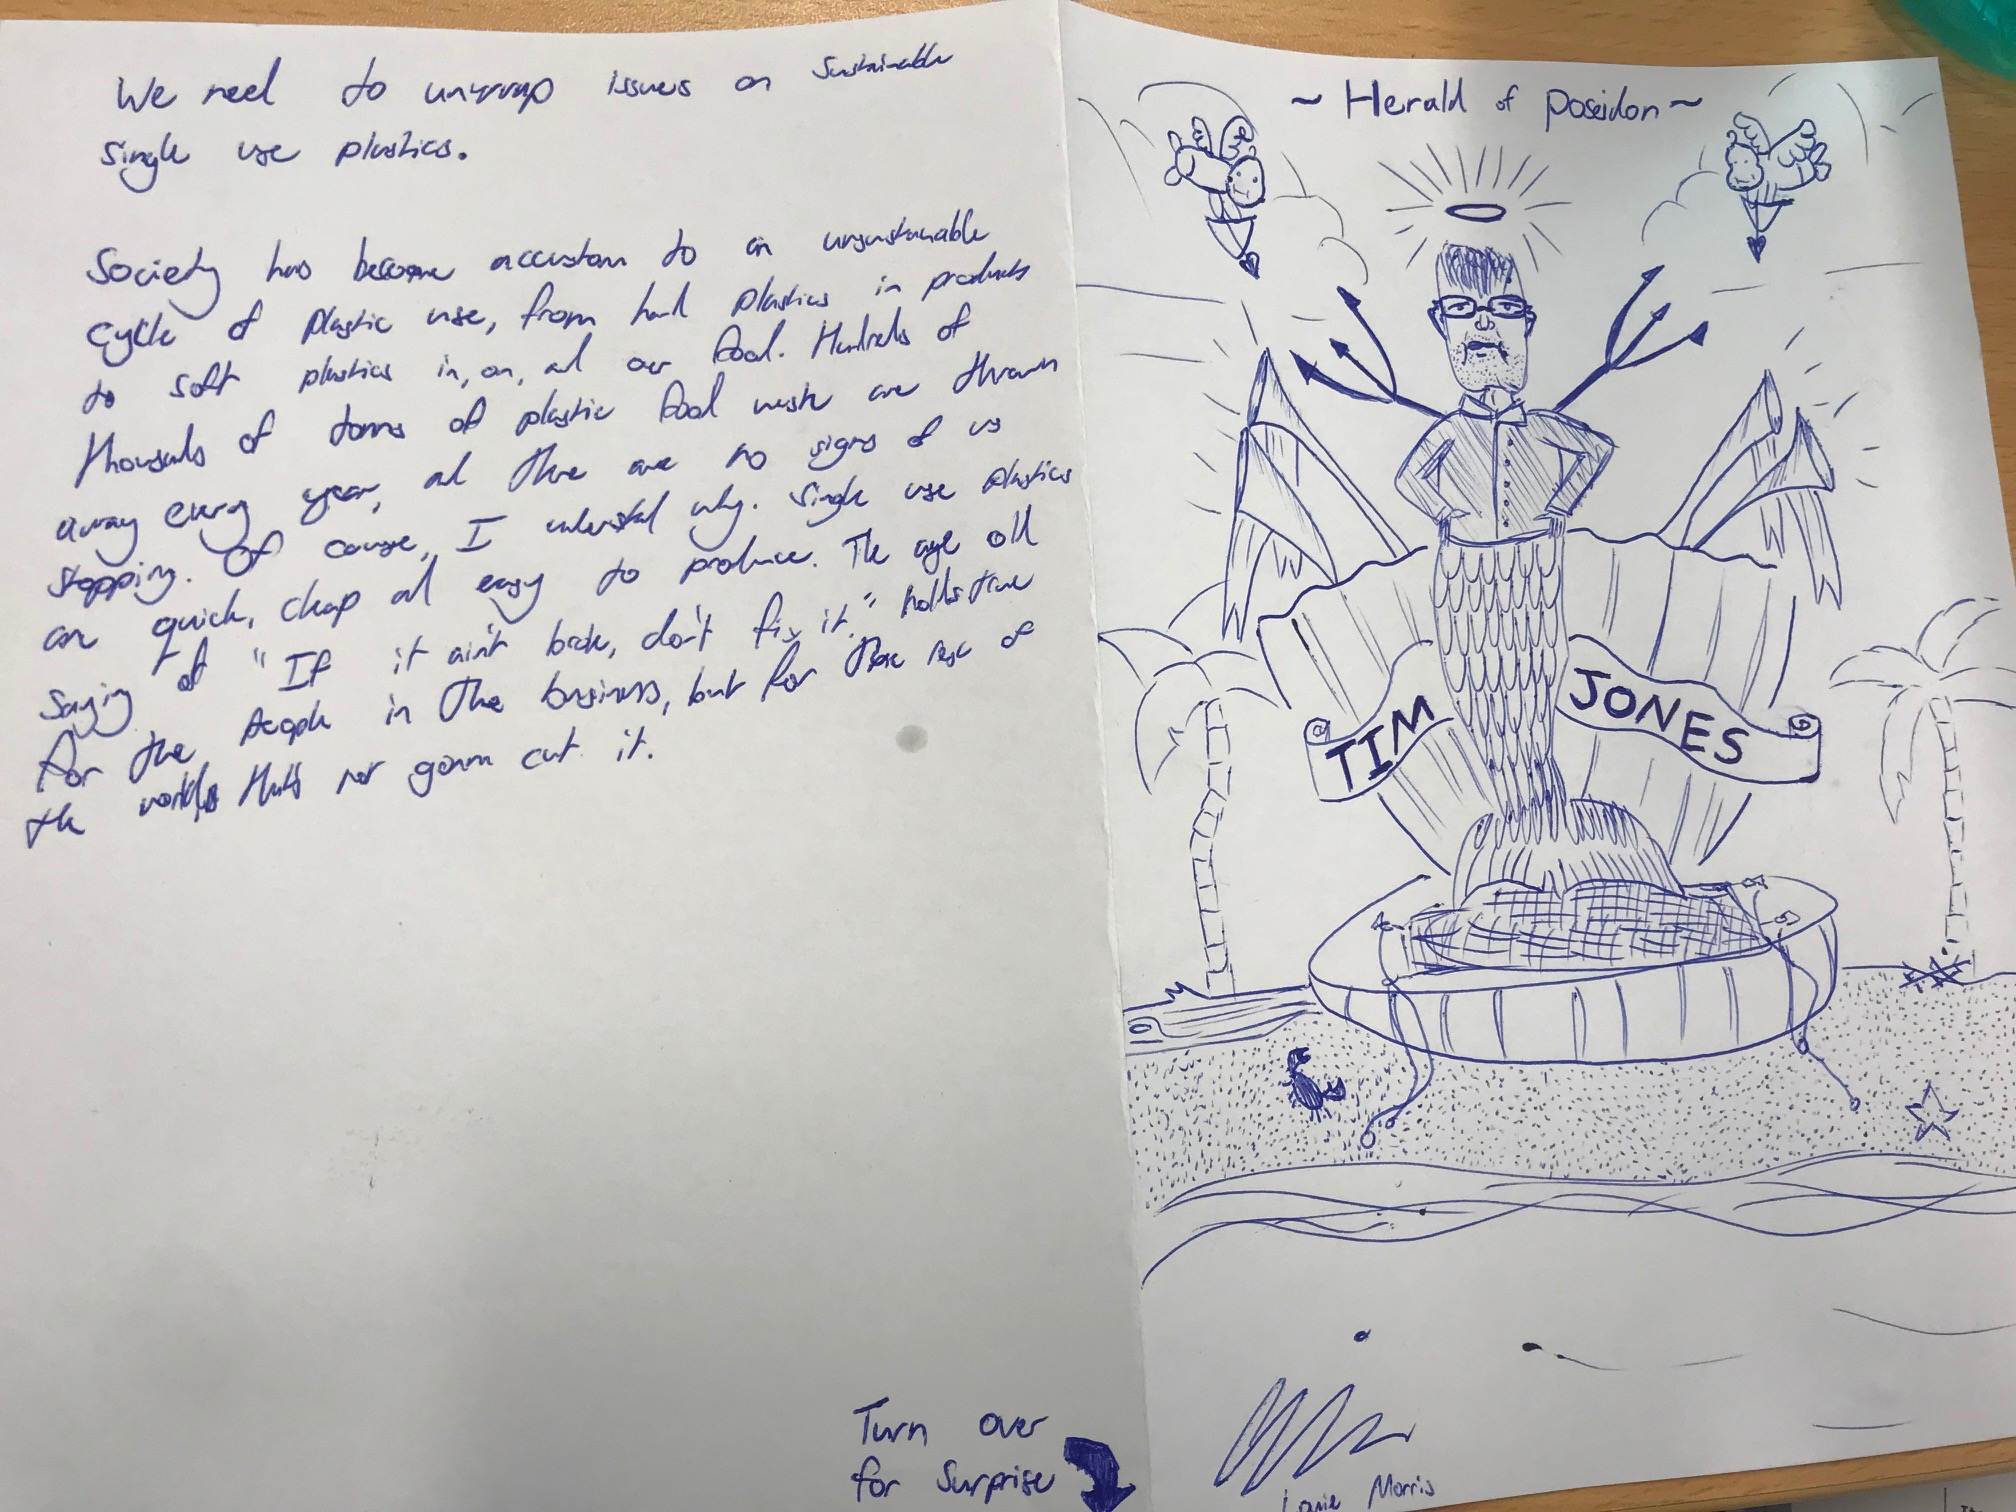 Handwriting and hand-drawn image of Tim Jones by a Motueka High School student